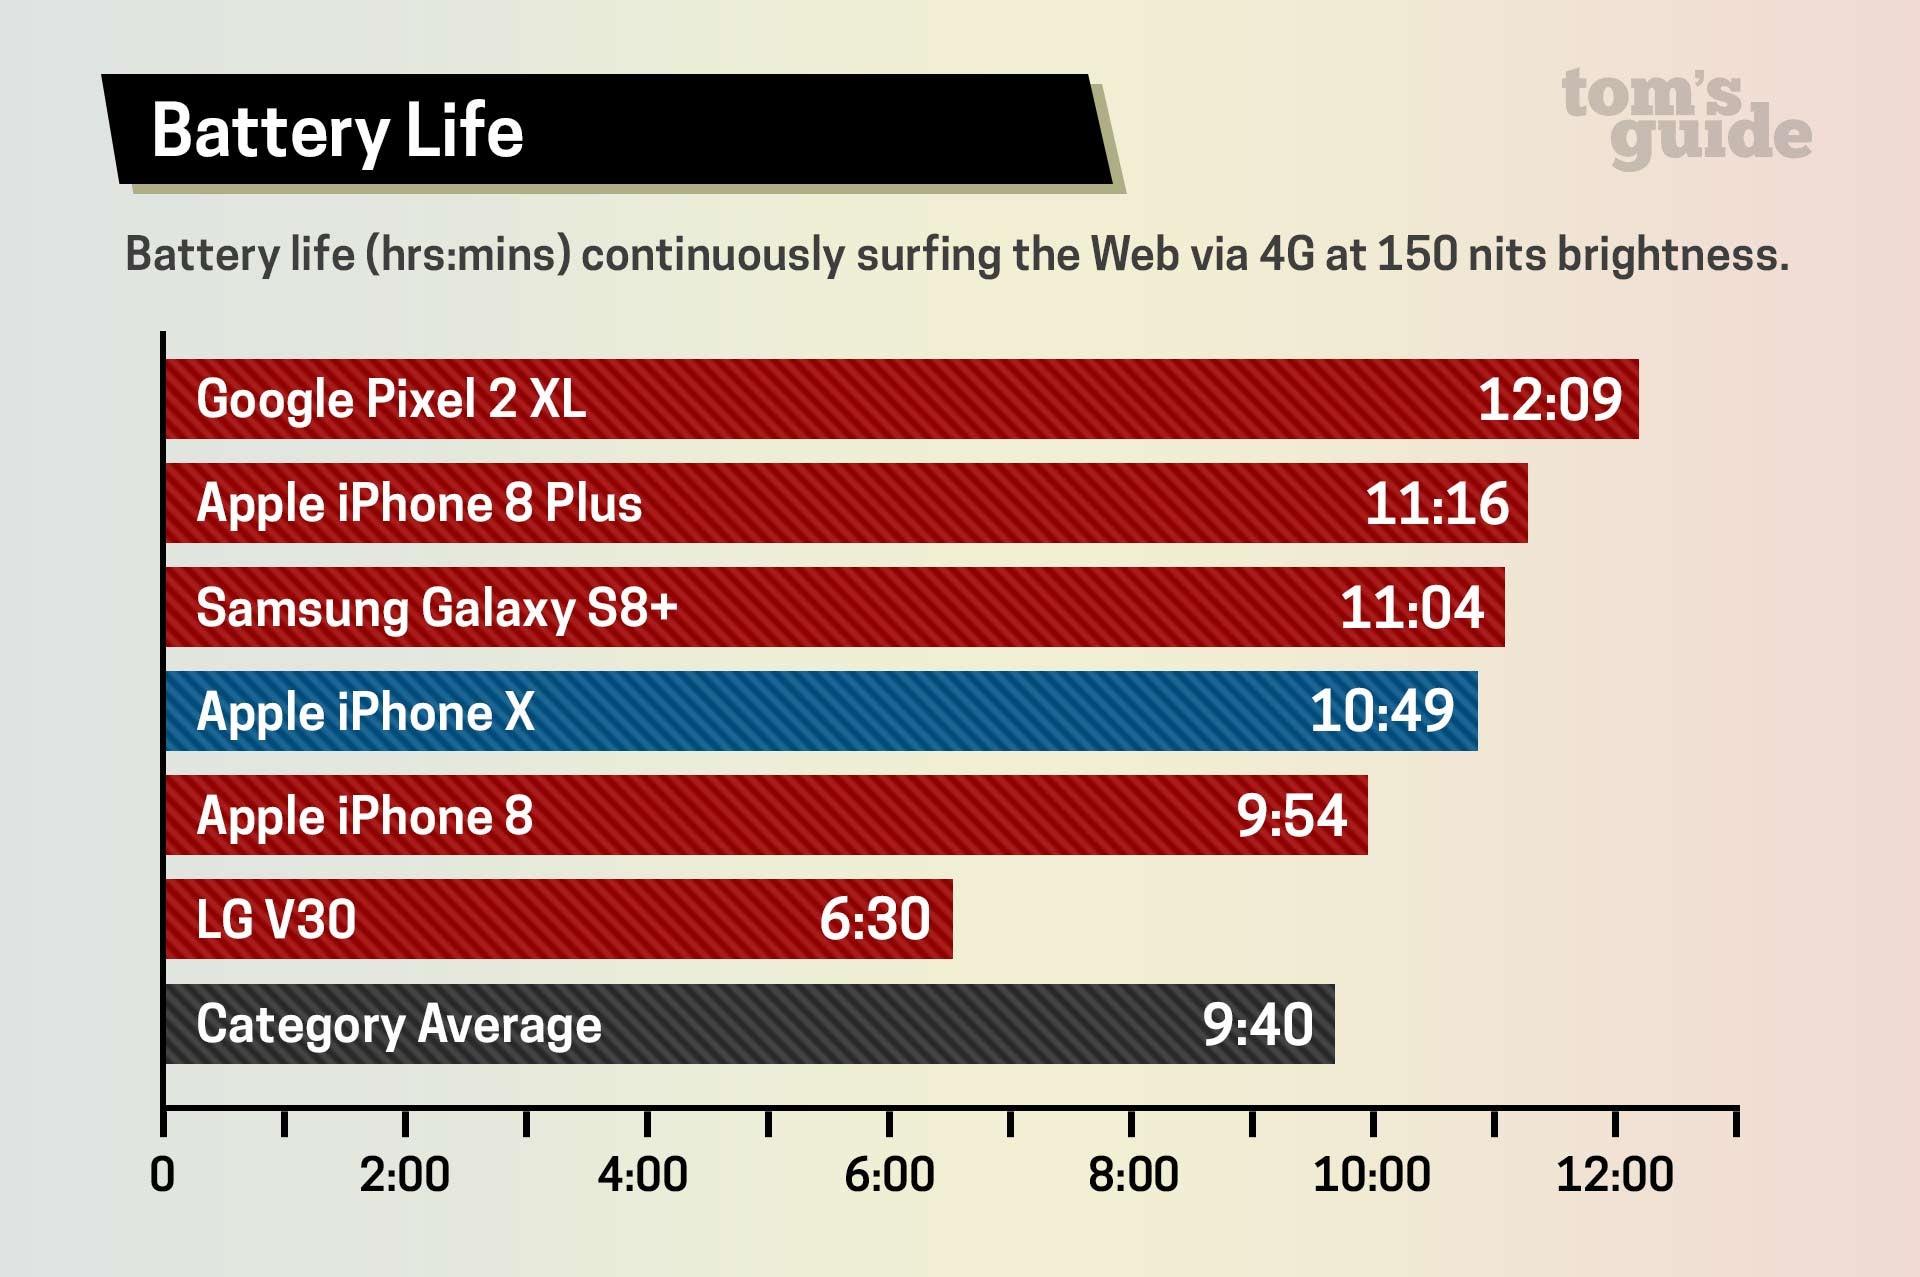 iphone 8 plus battery life vs iphone 7